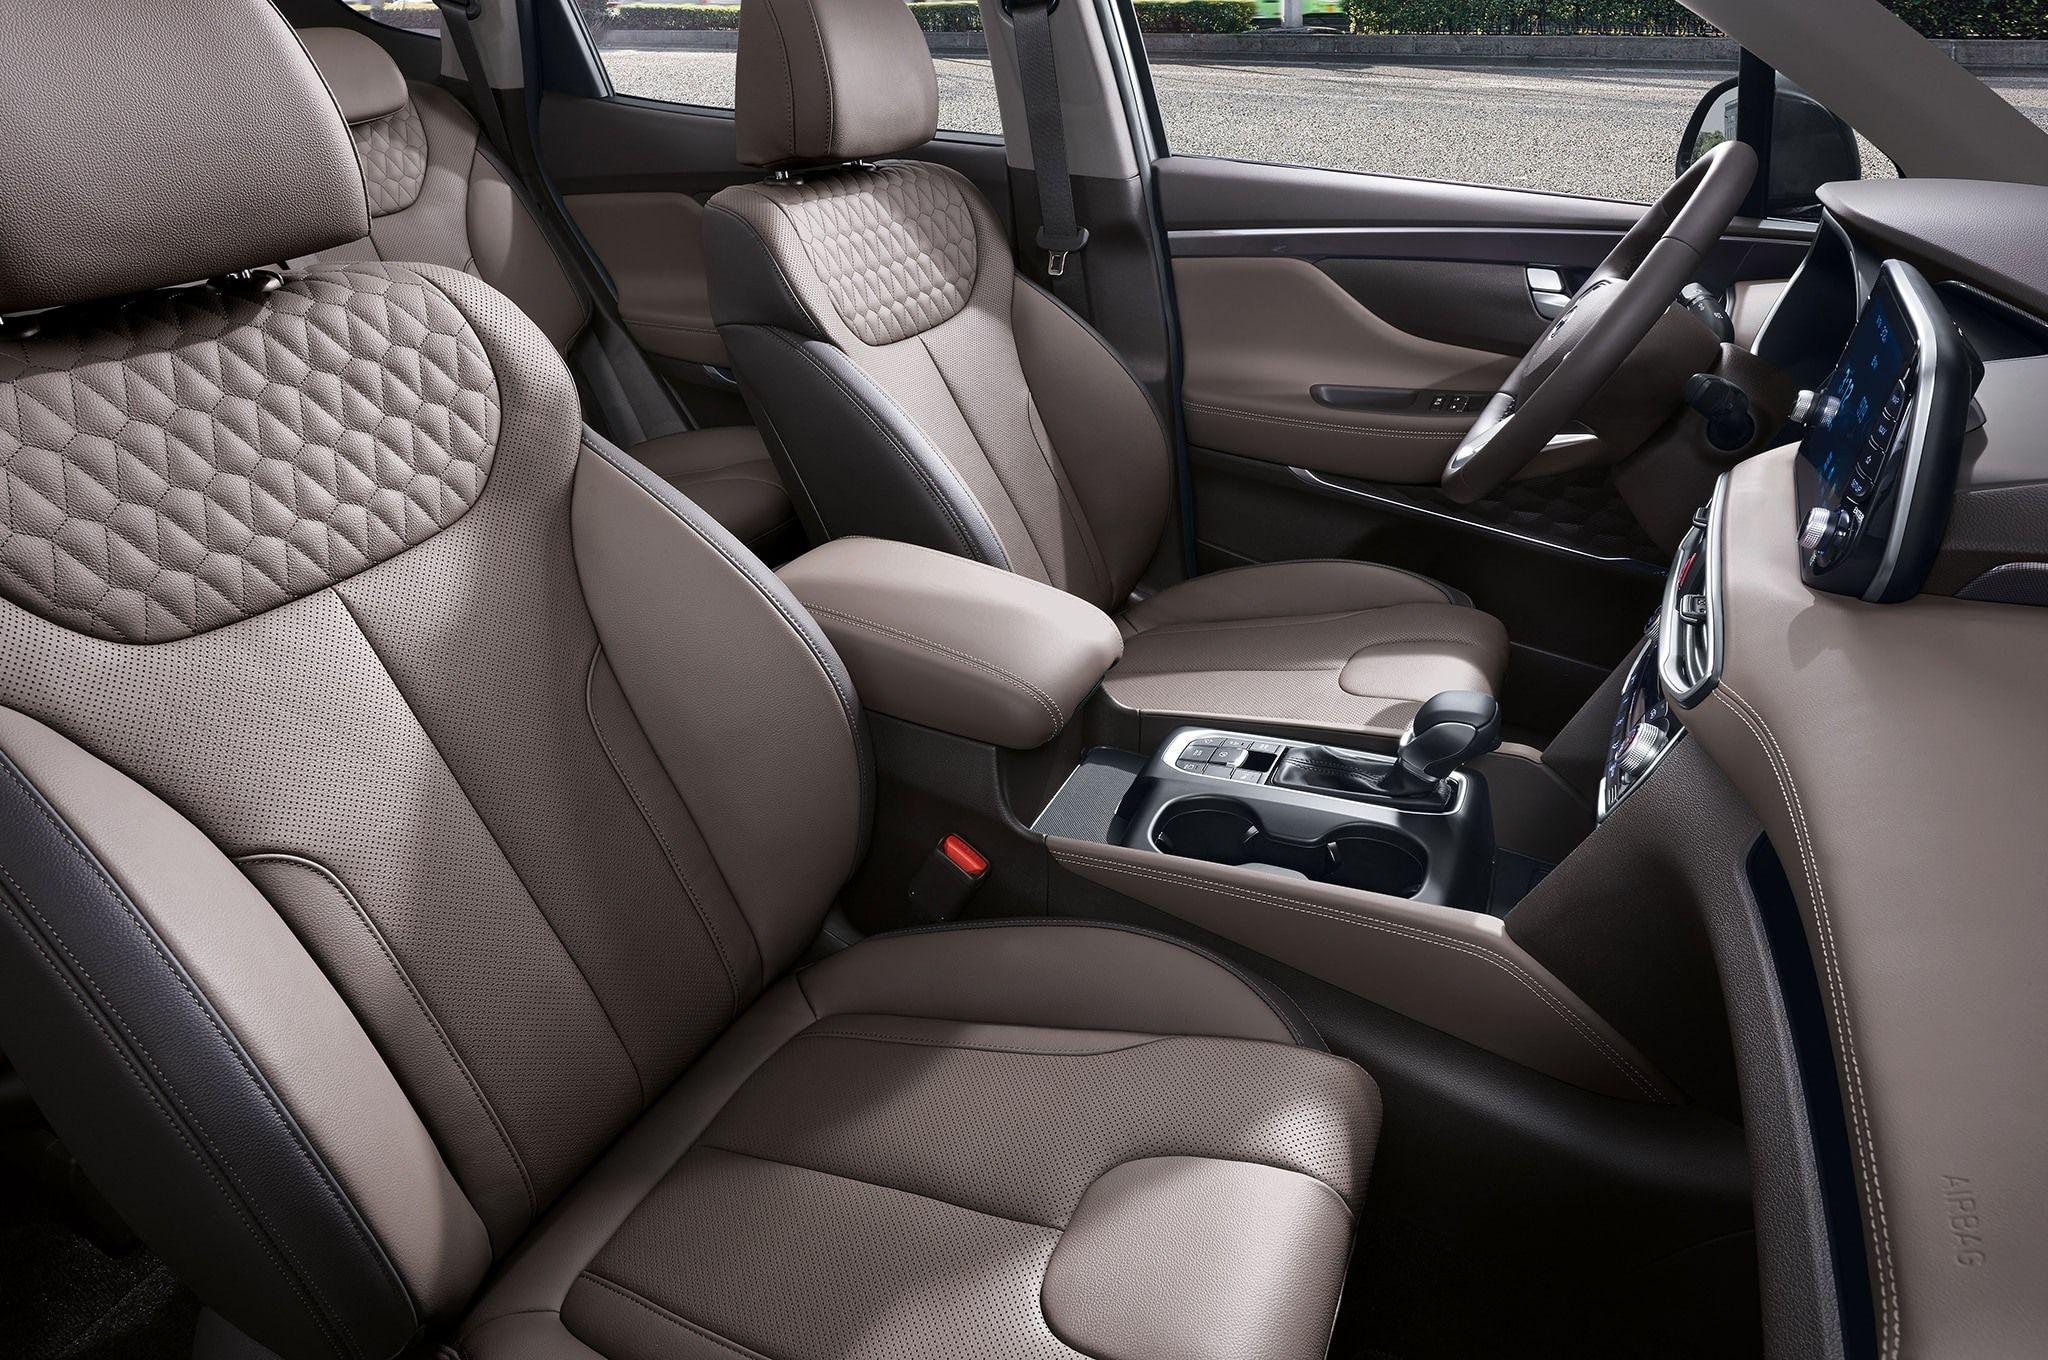 New Hyundai Santa Fe 2020 Interior